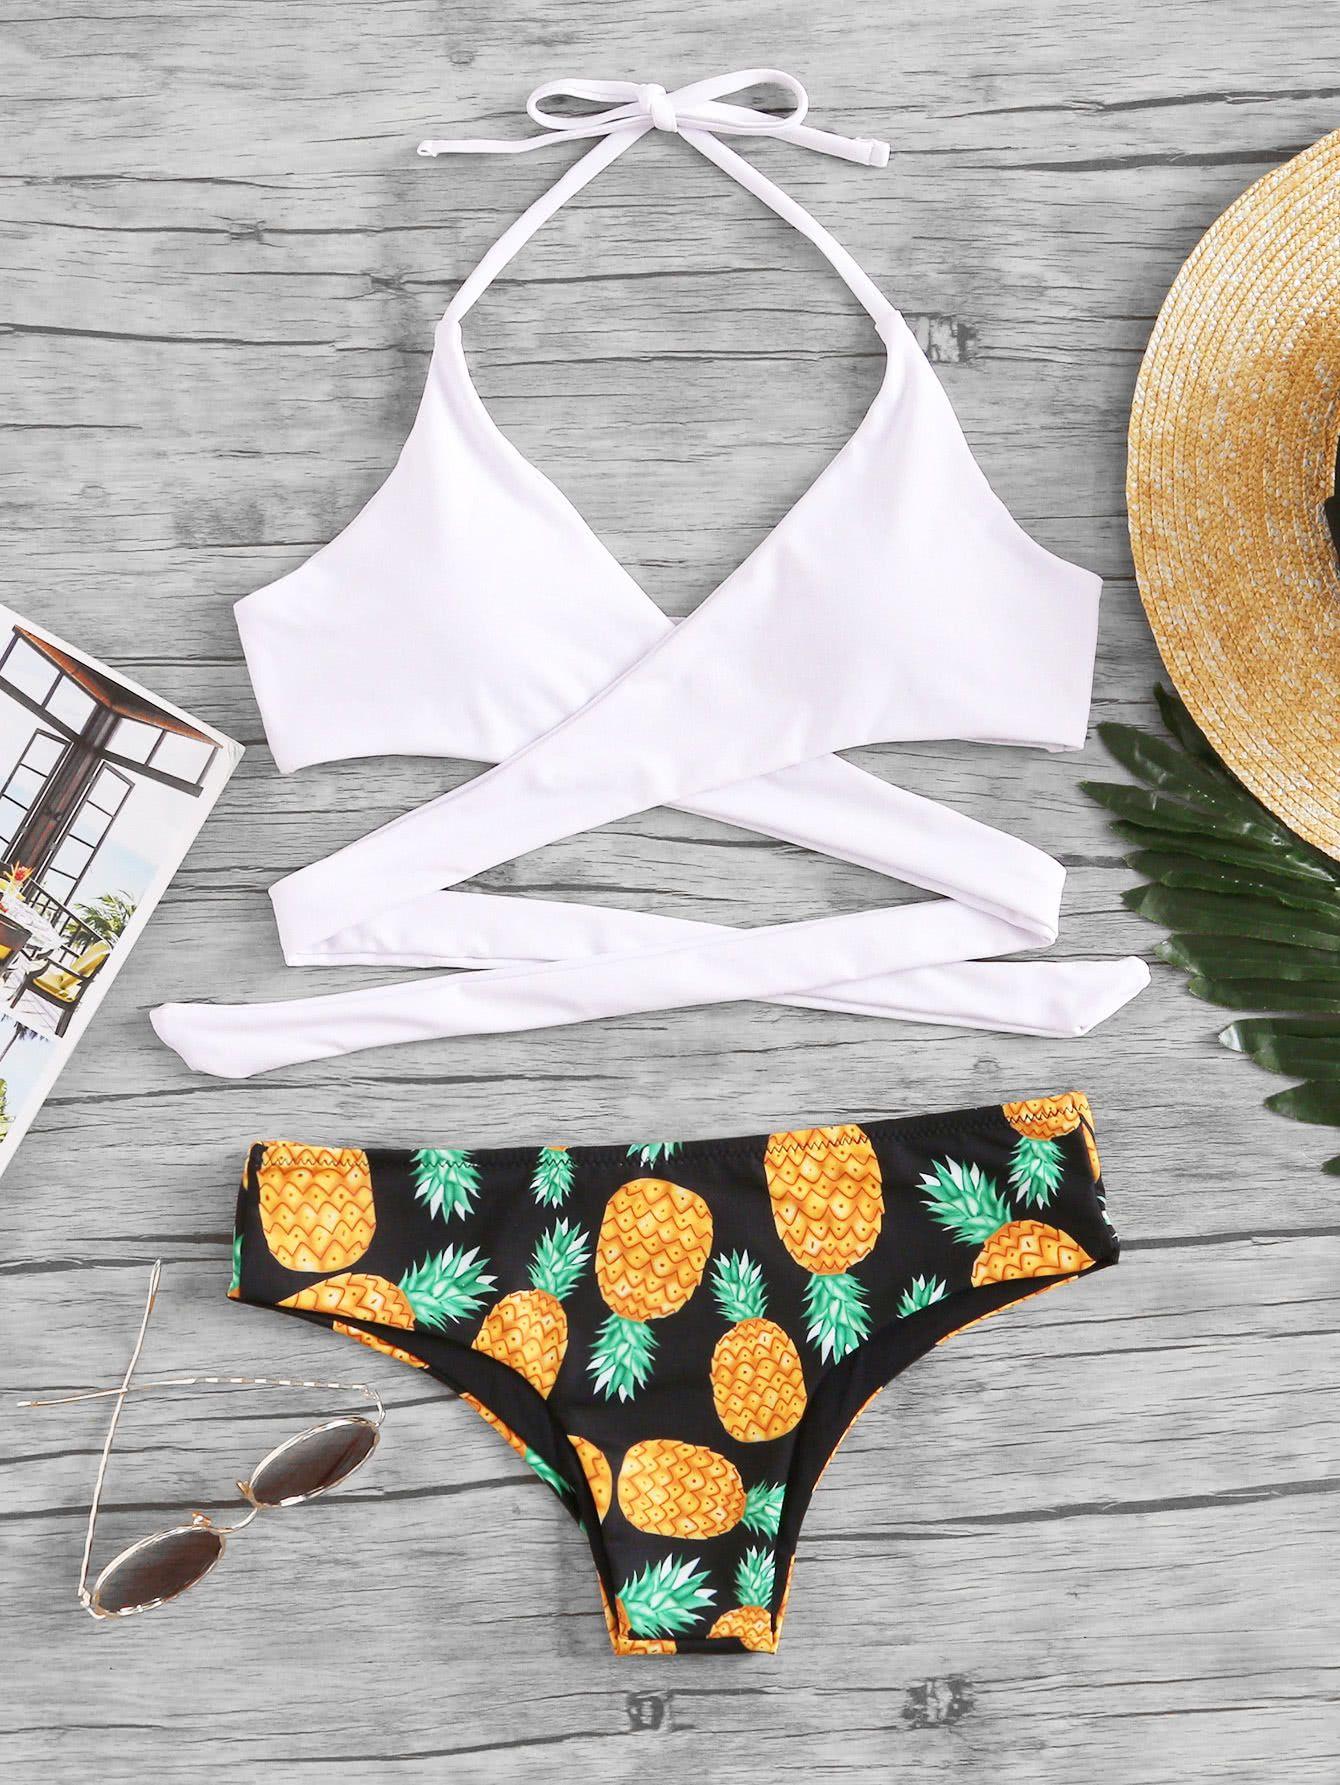 9c0a442a9d Shop Pineapple Print Wrap Bikini Set online. SheIn offers Pineapple Print  Wrap Bikini Set & more to fit your fashionable needs.